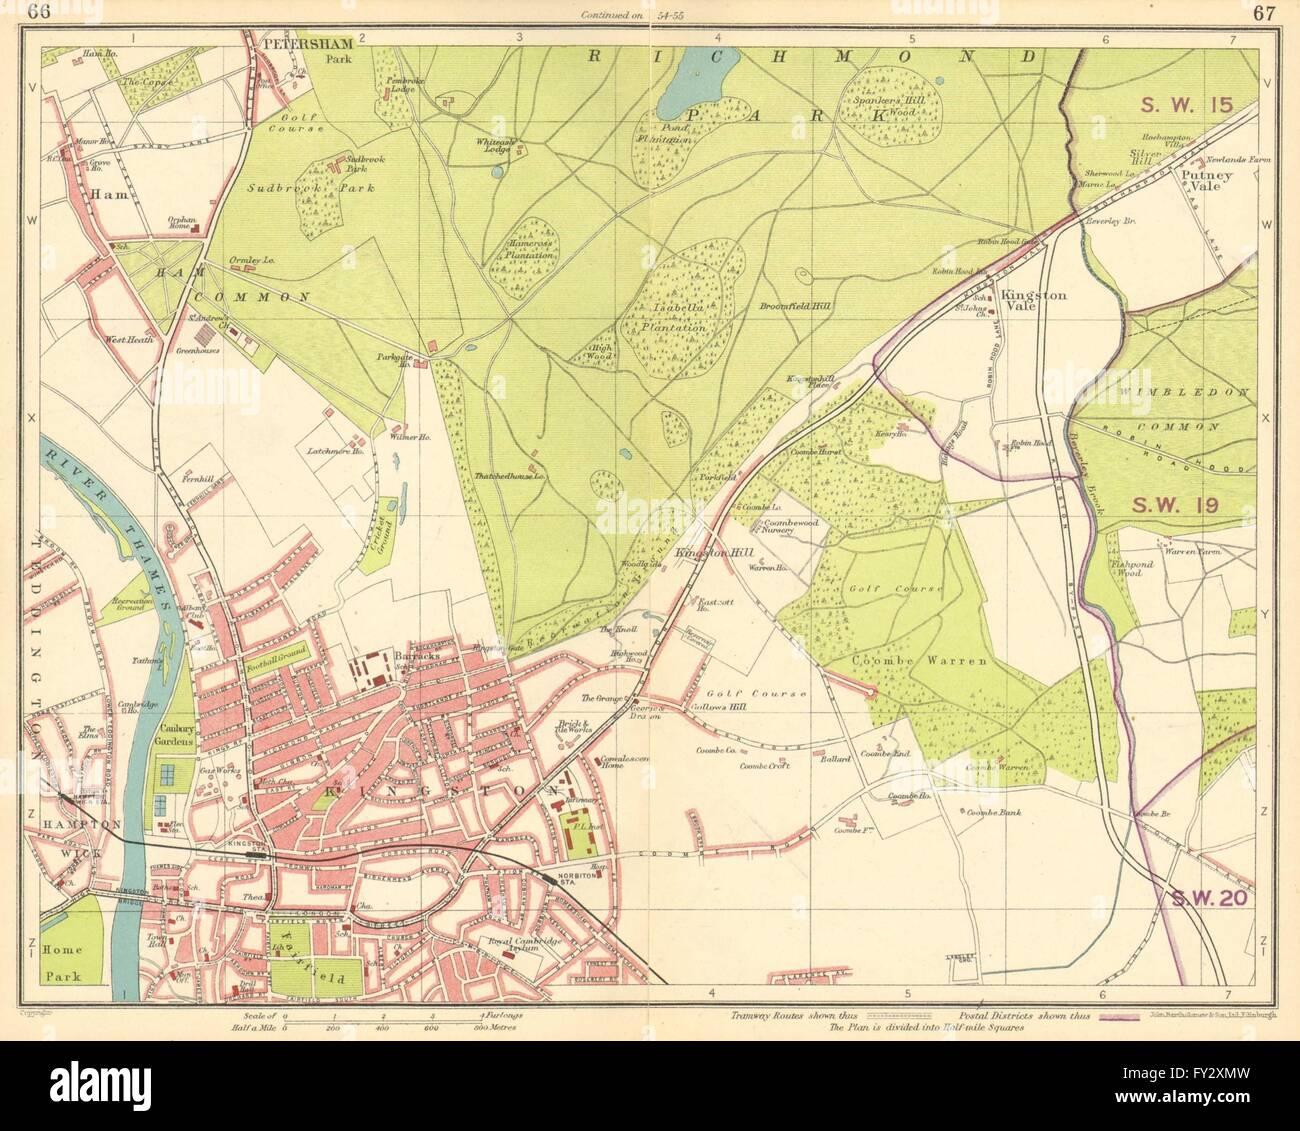 Richmond London Map.London Sw Richmond Wimbledon Putney Twickenham Kingston Upon Thames